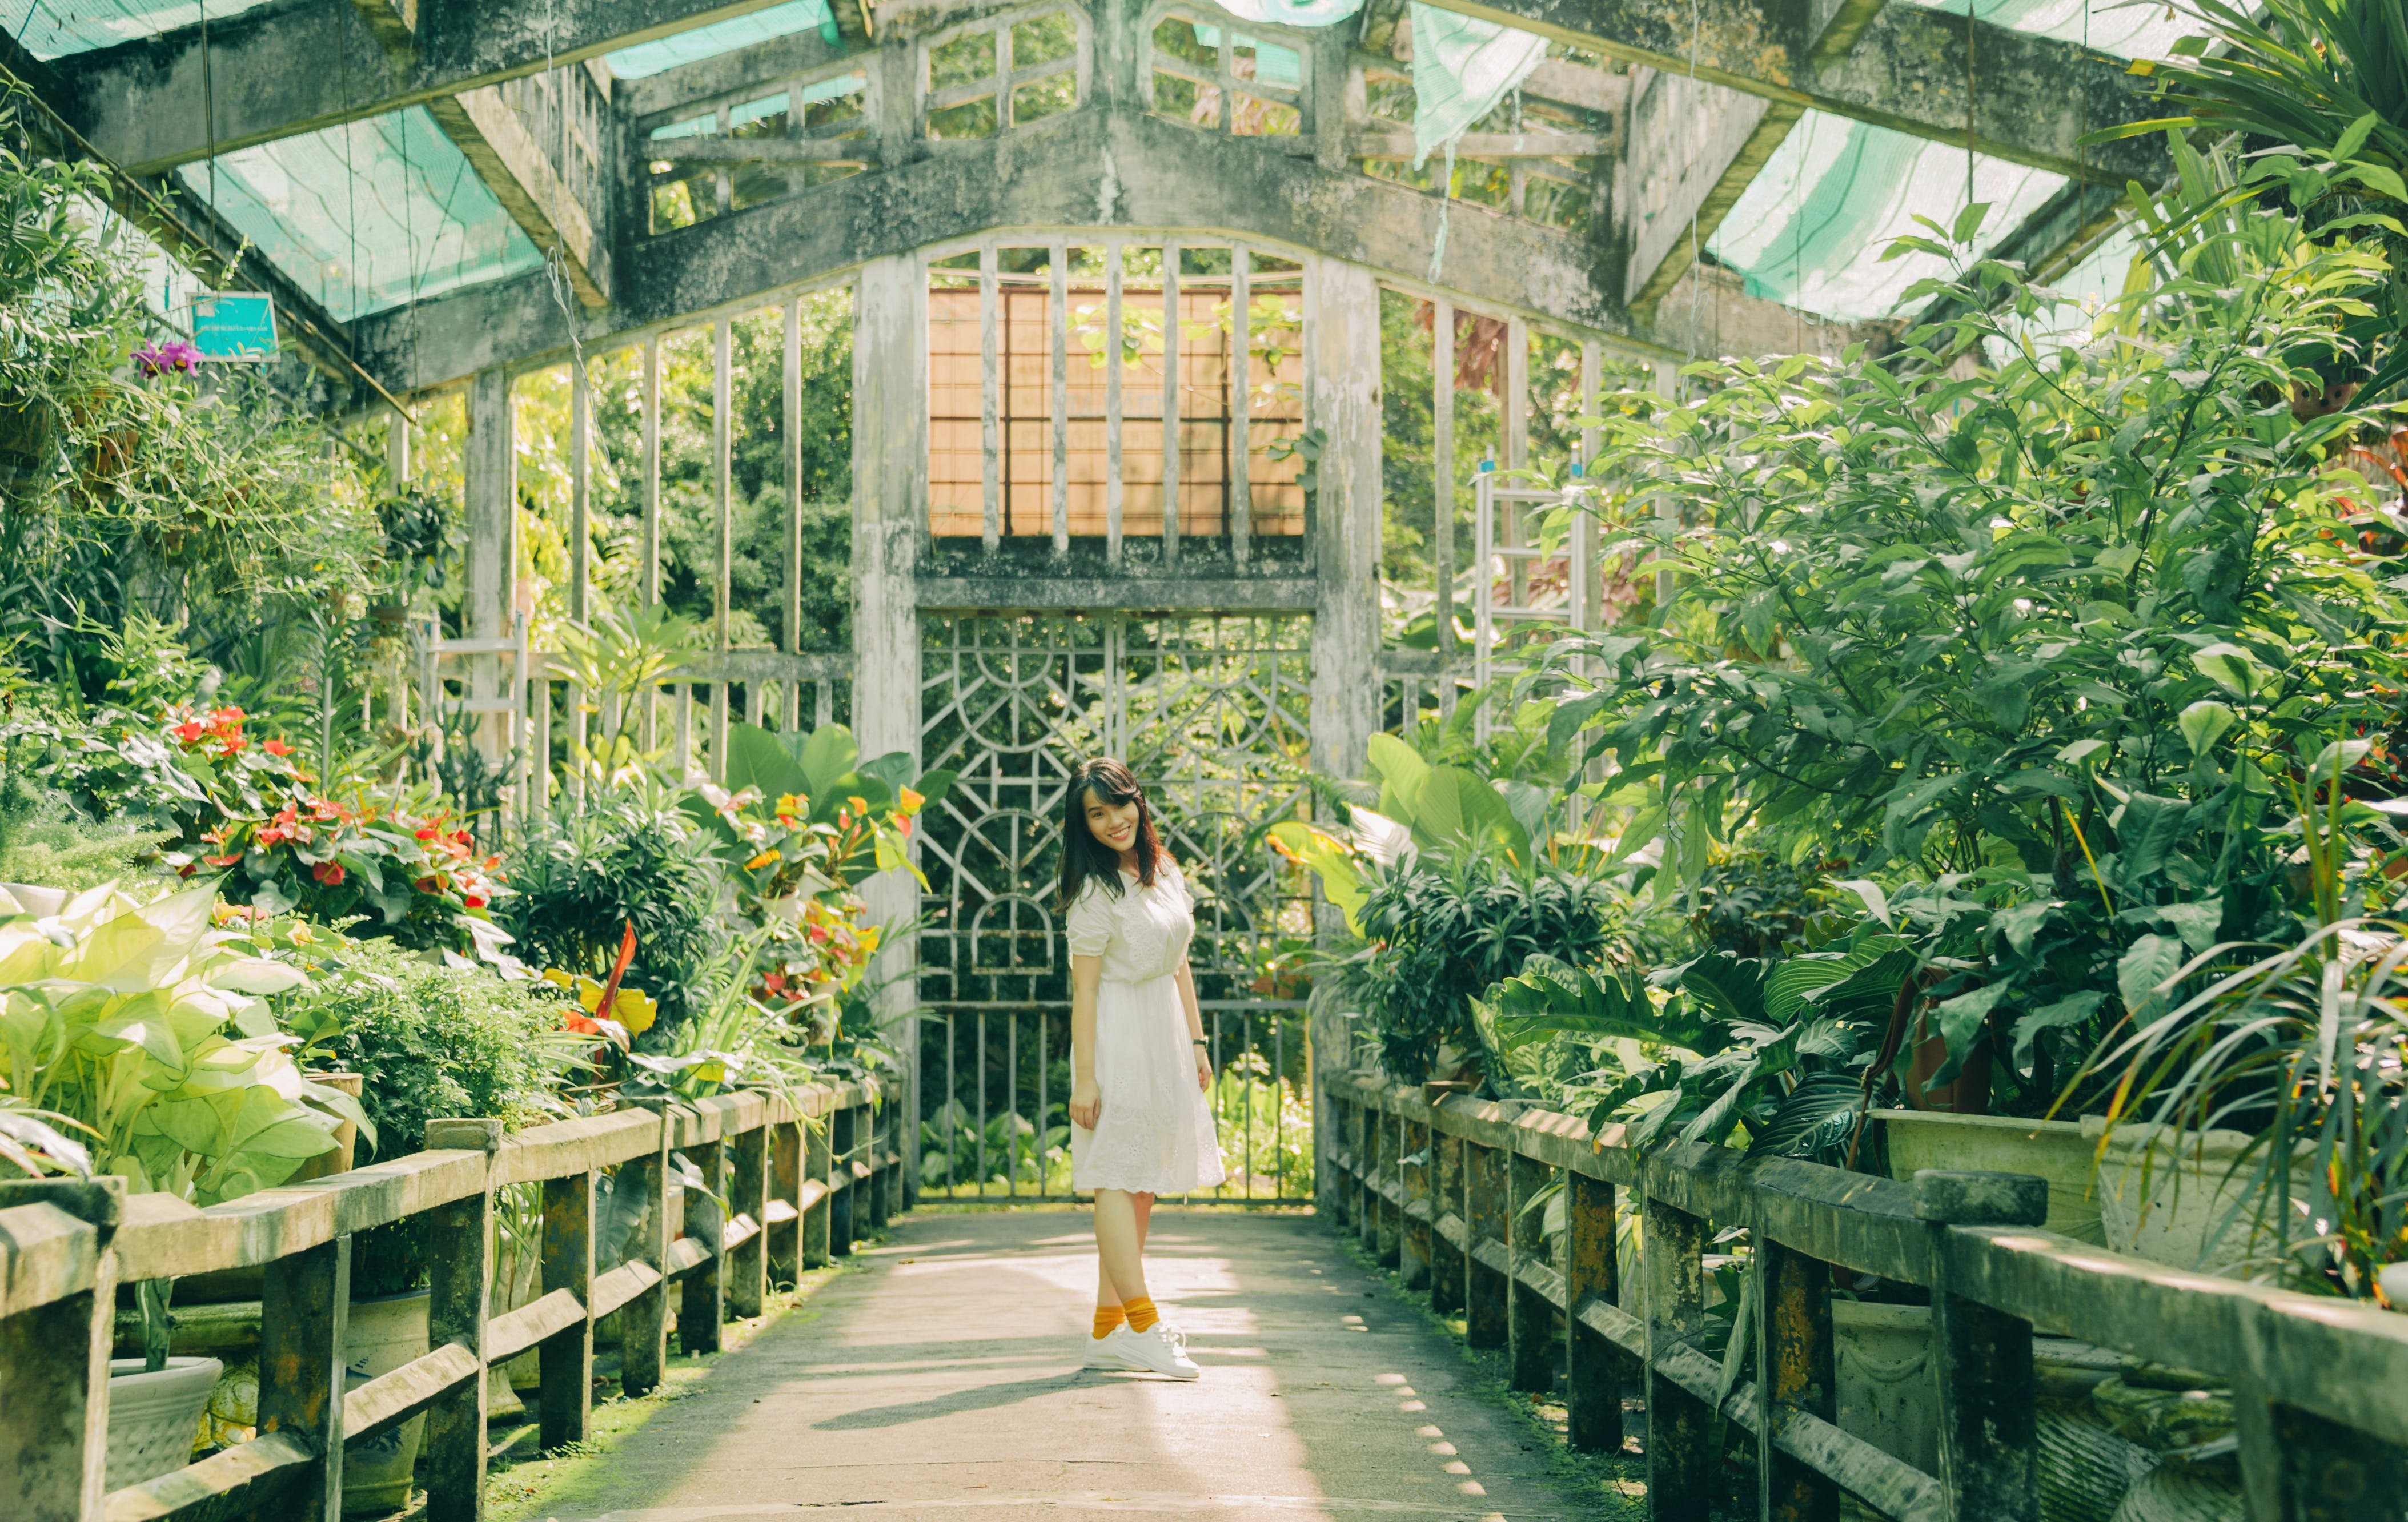 Woman Standing Inside Green House